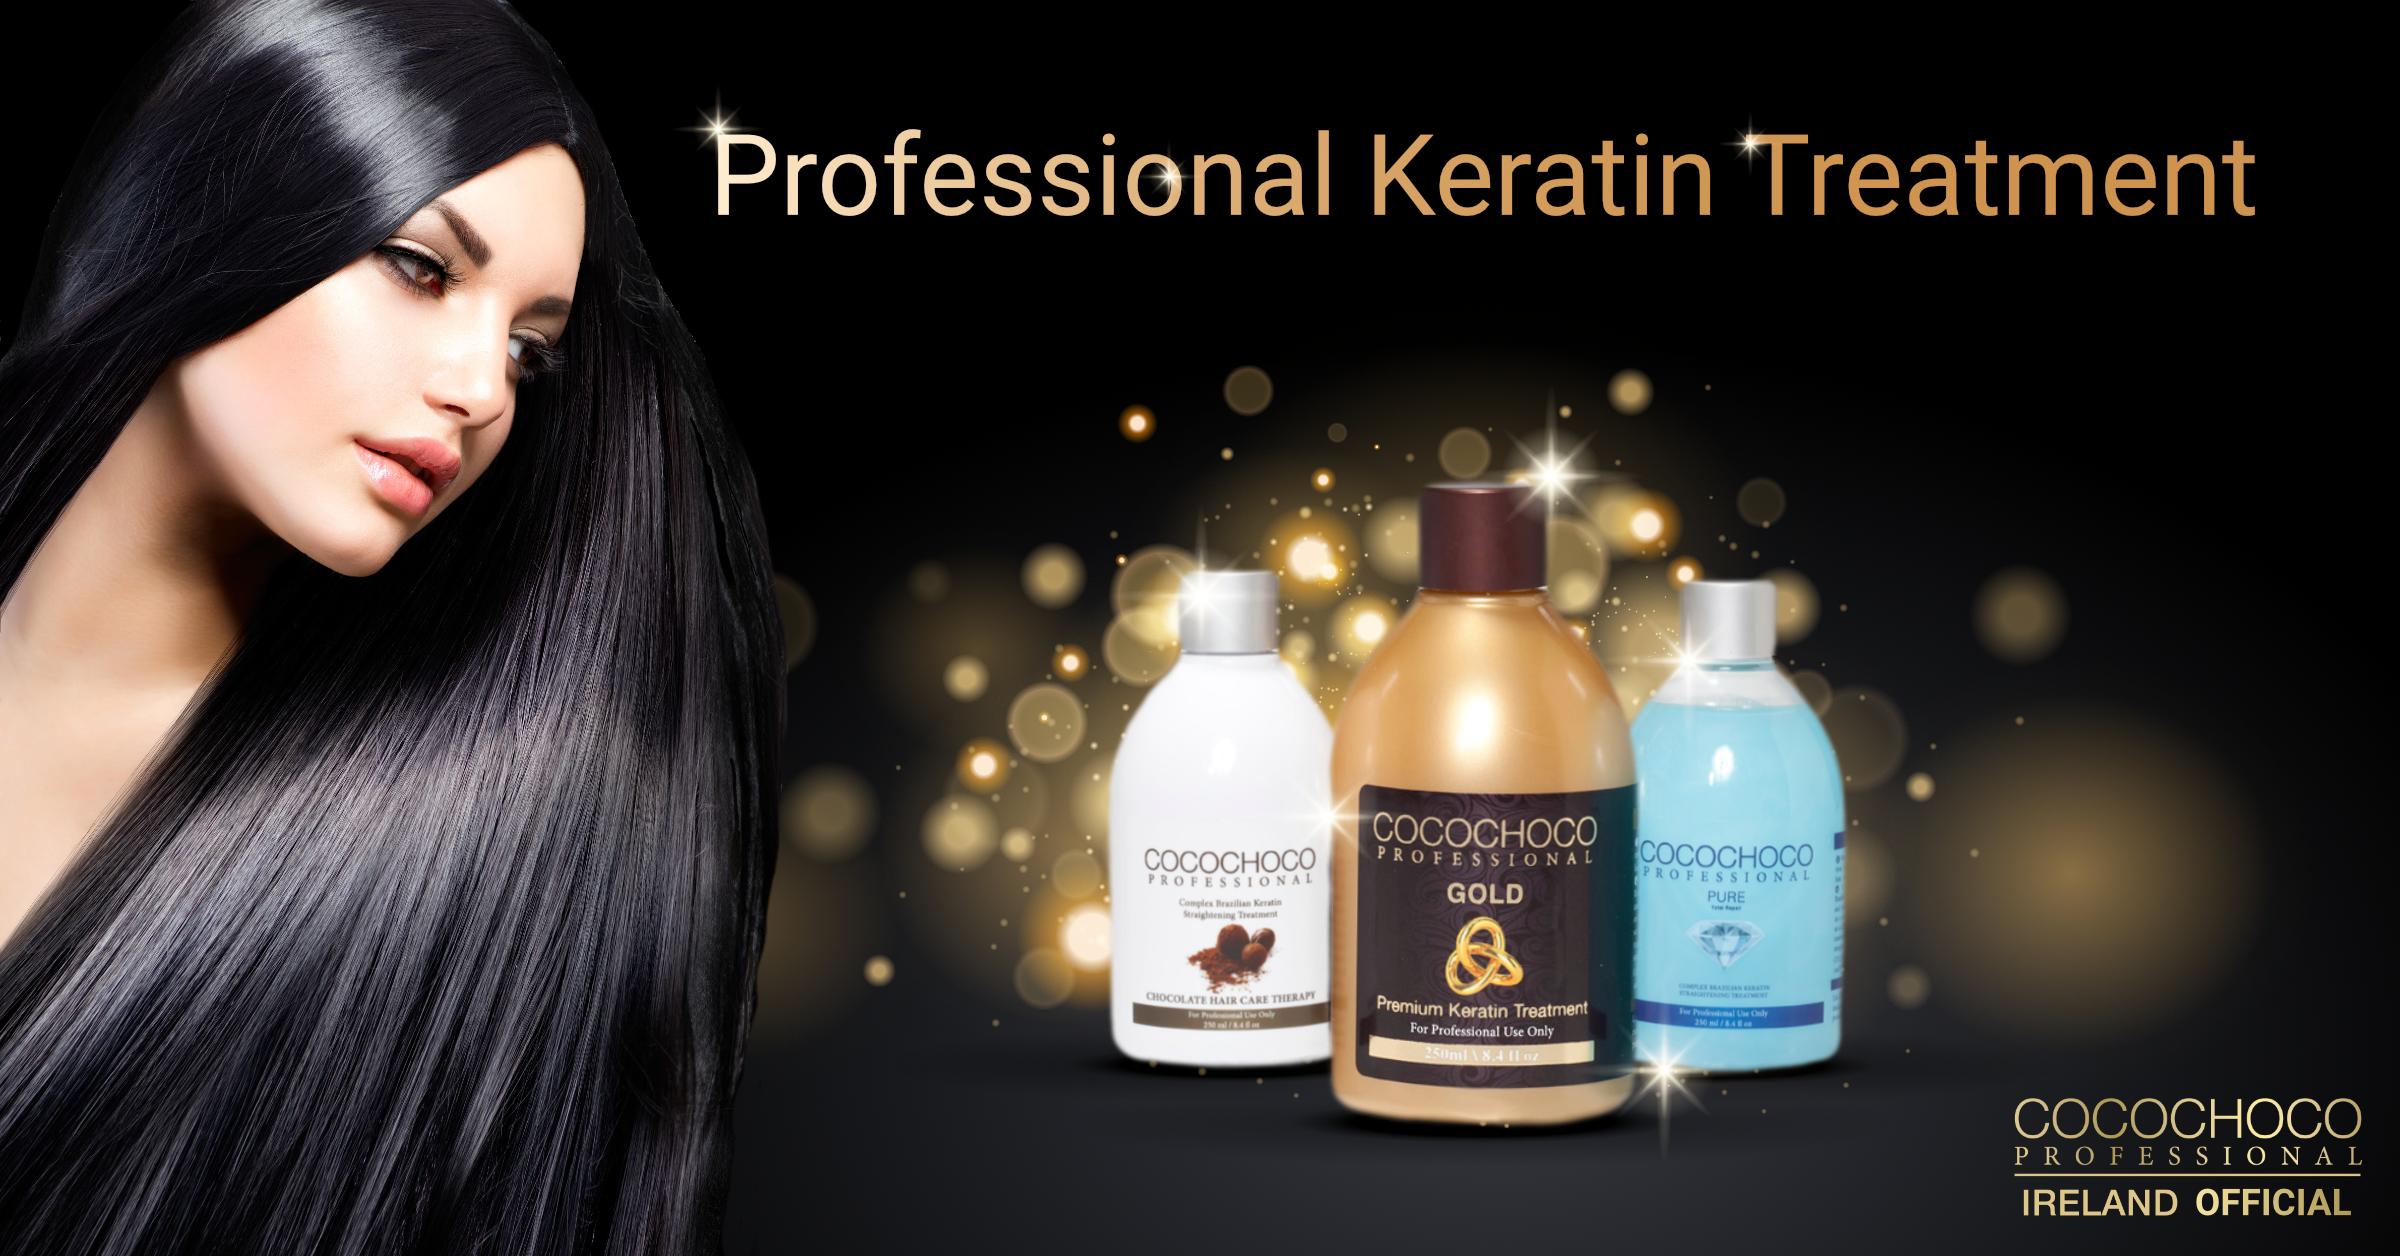 Keratin Hair Straightening Cocochoco Ireland Official